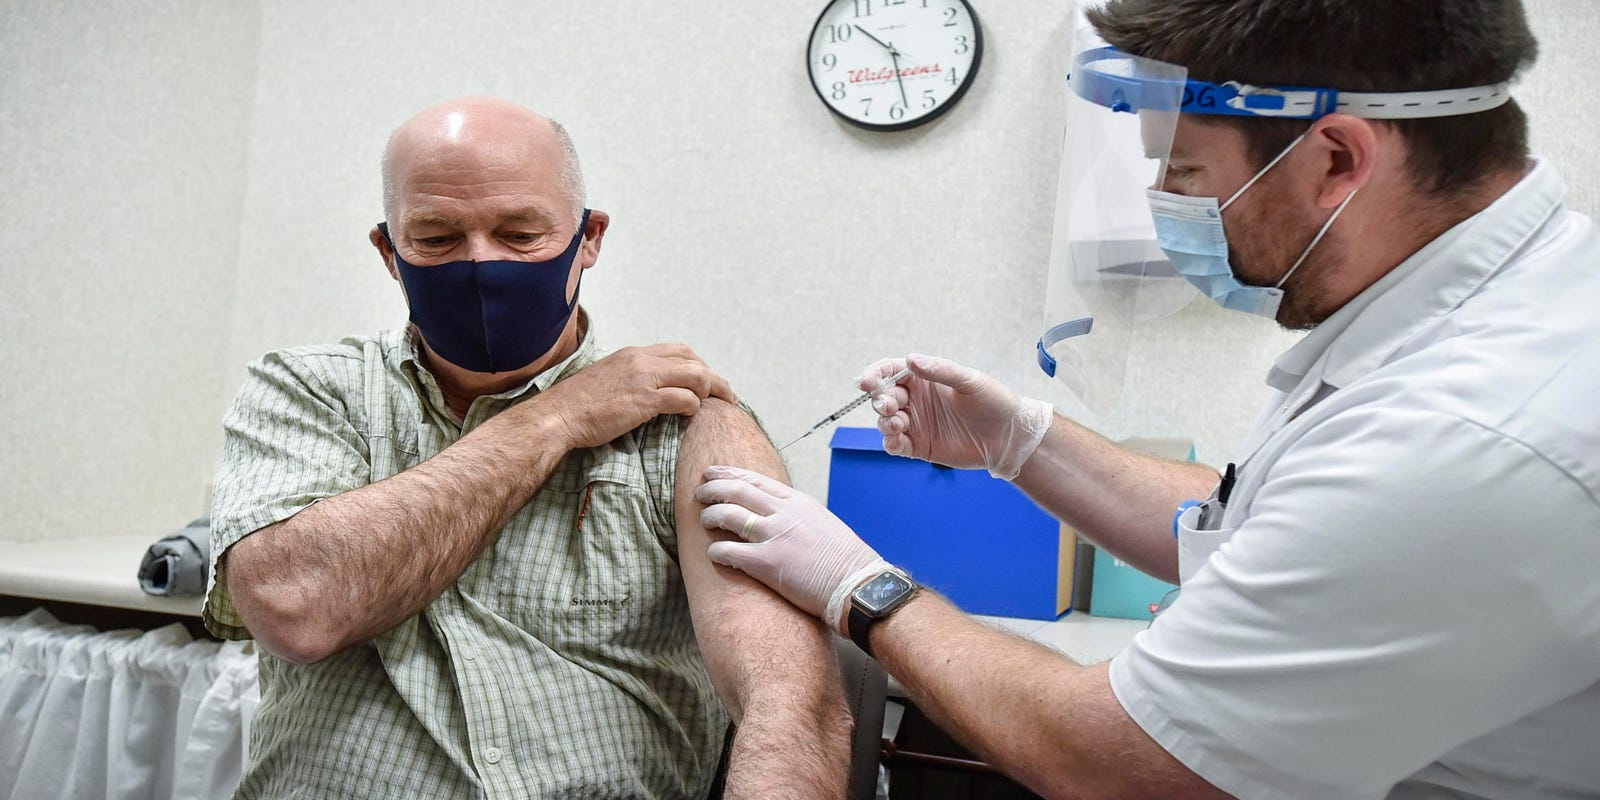 Walgreens announces $25 giveaway for new COVID-19 vaccine recipients